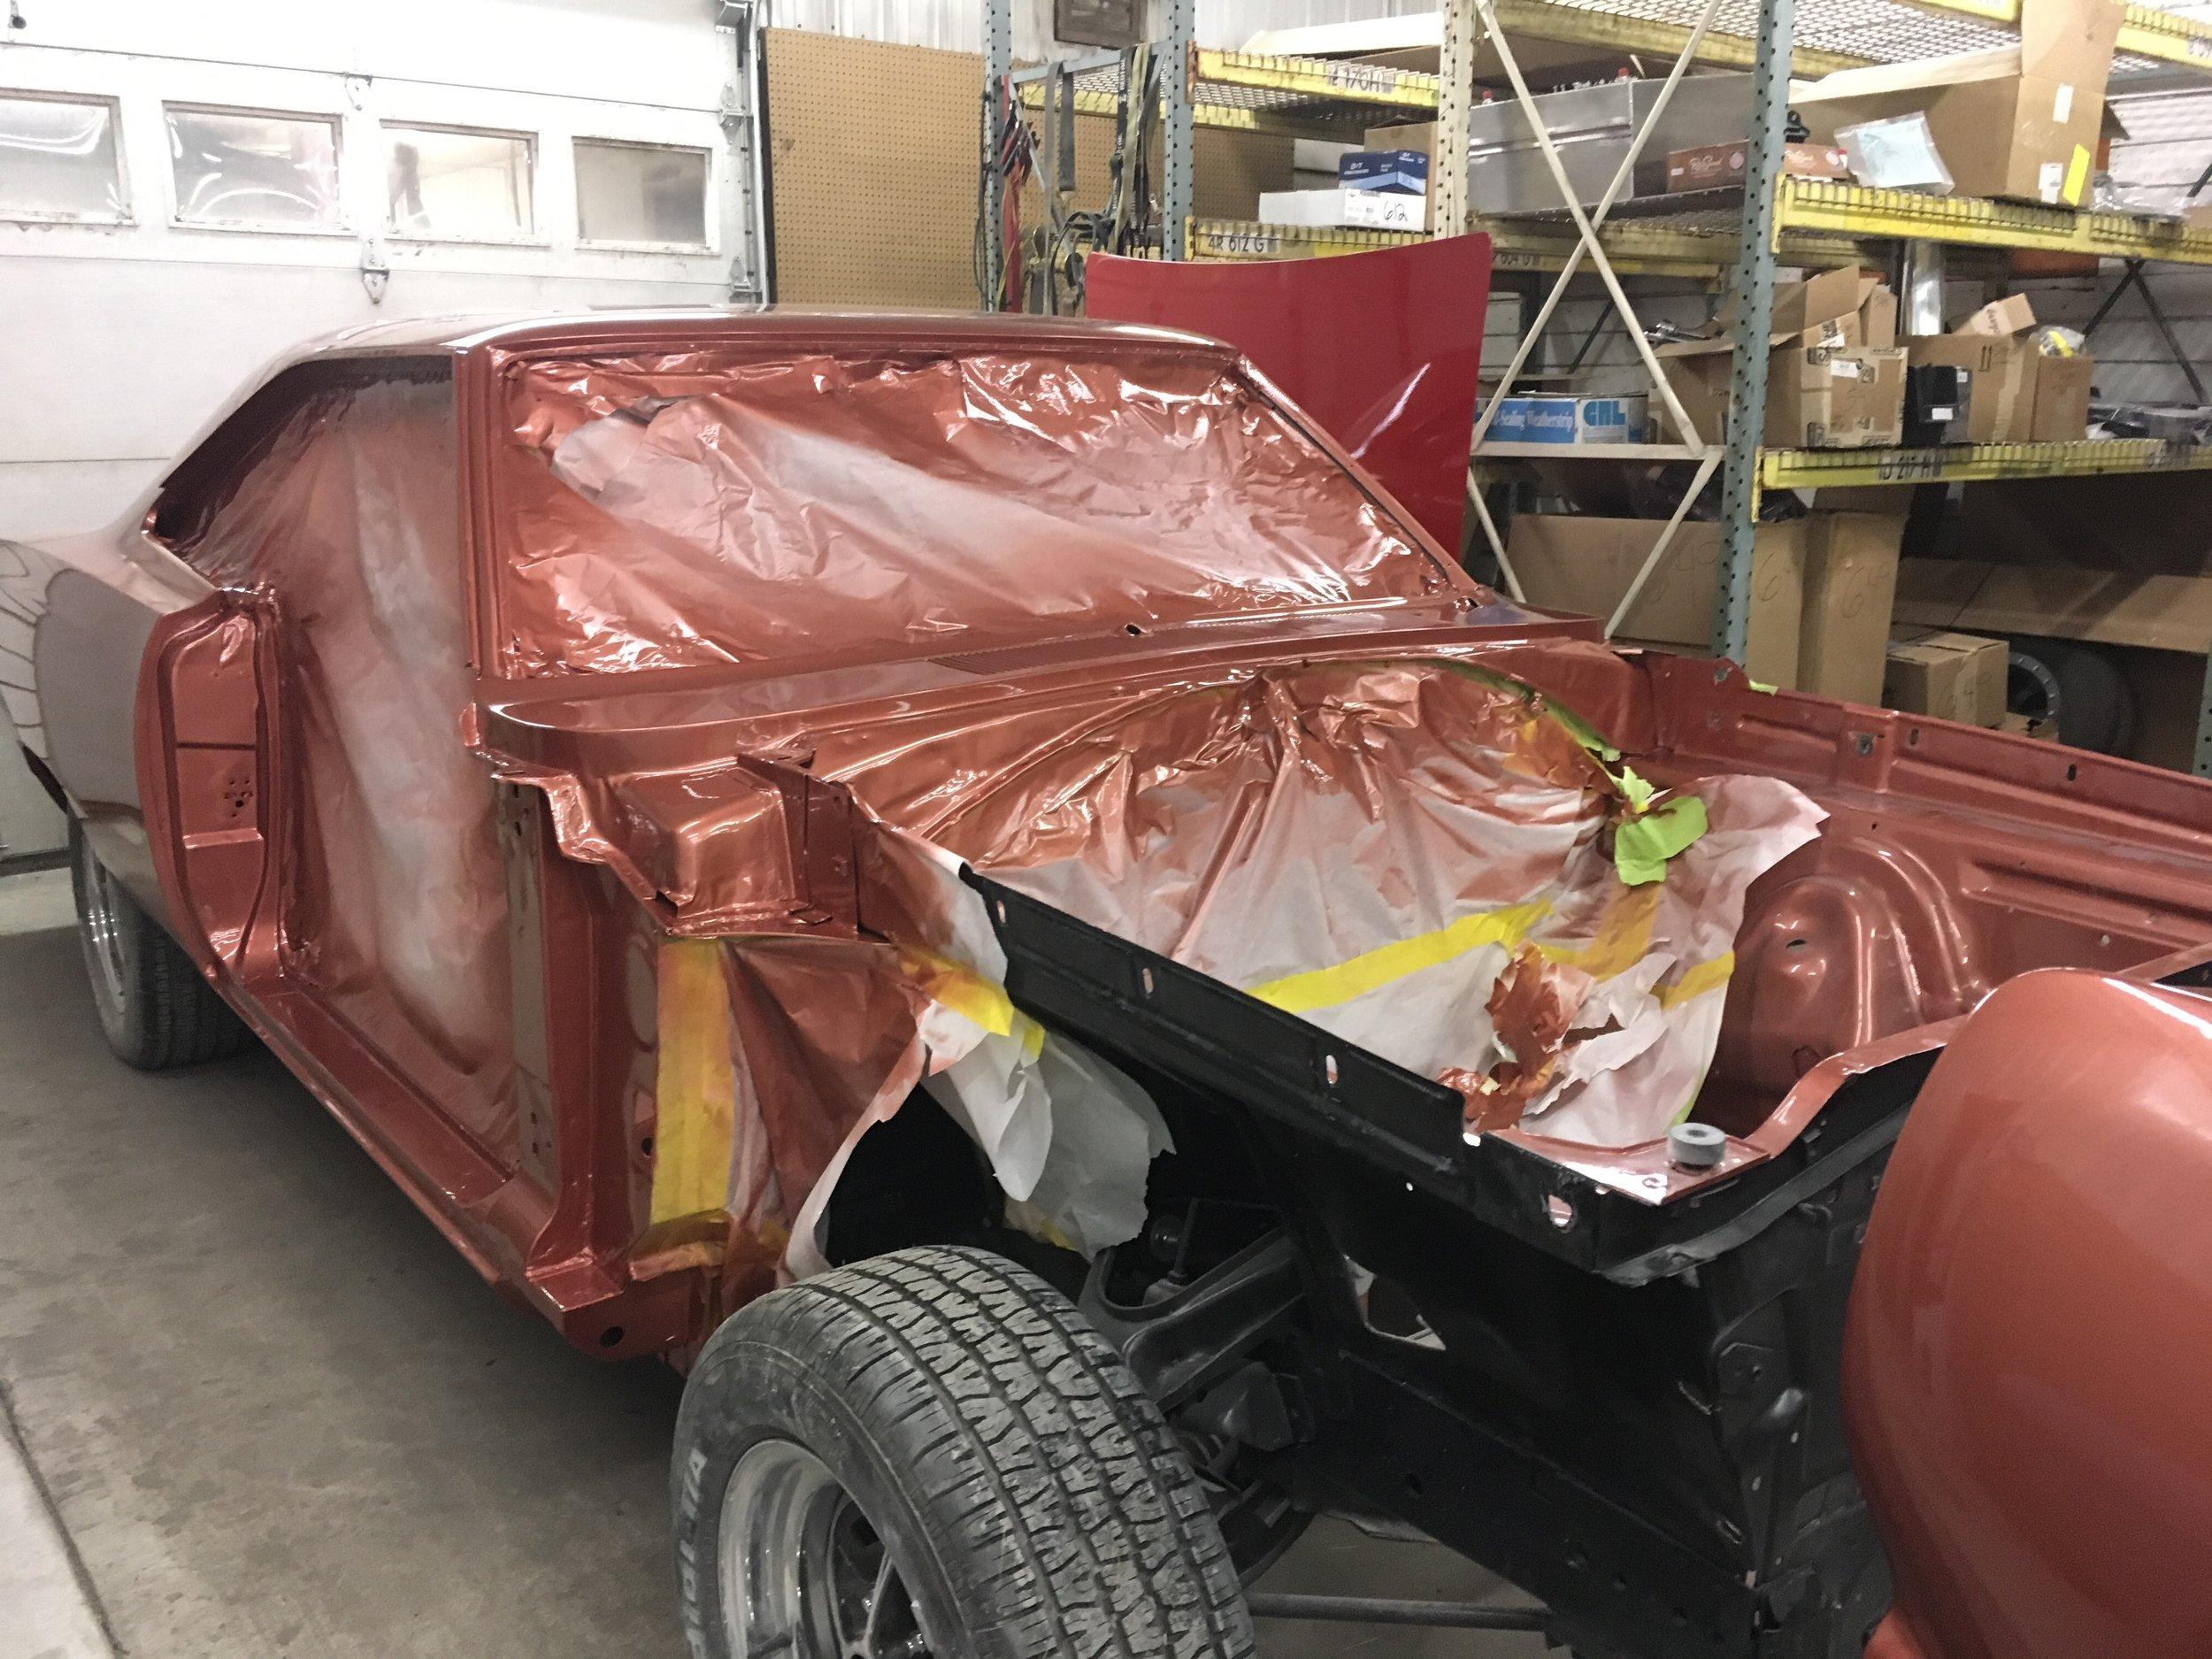 1968-Plymouth-GTX-minneapolis-custom-built-hot-rod-restoration-body-work-and-painting.jpg